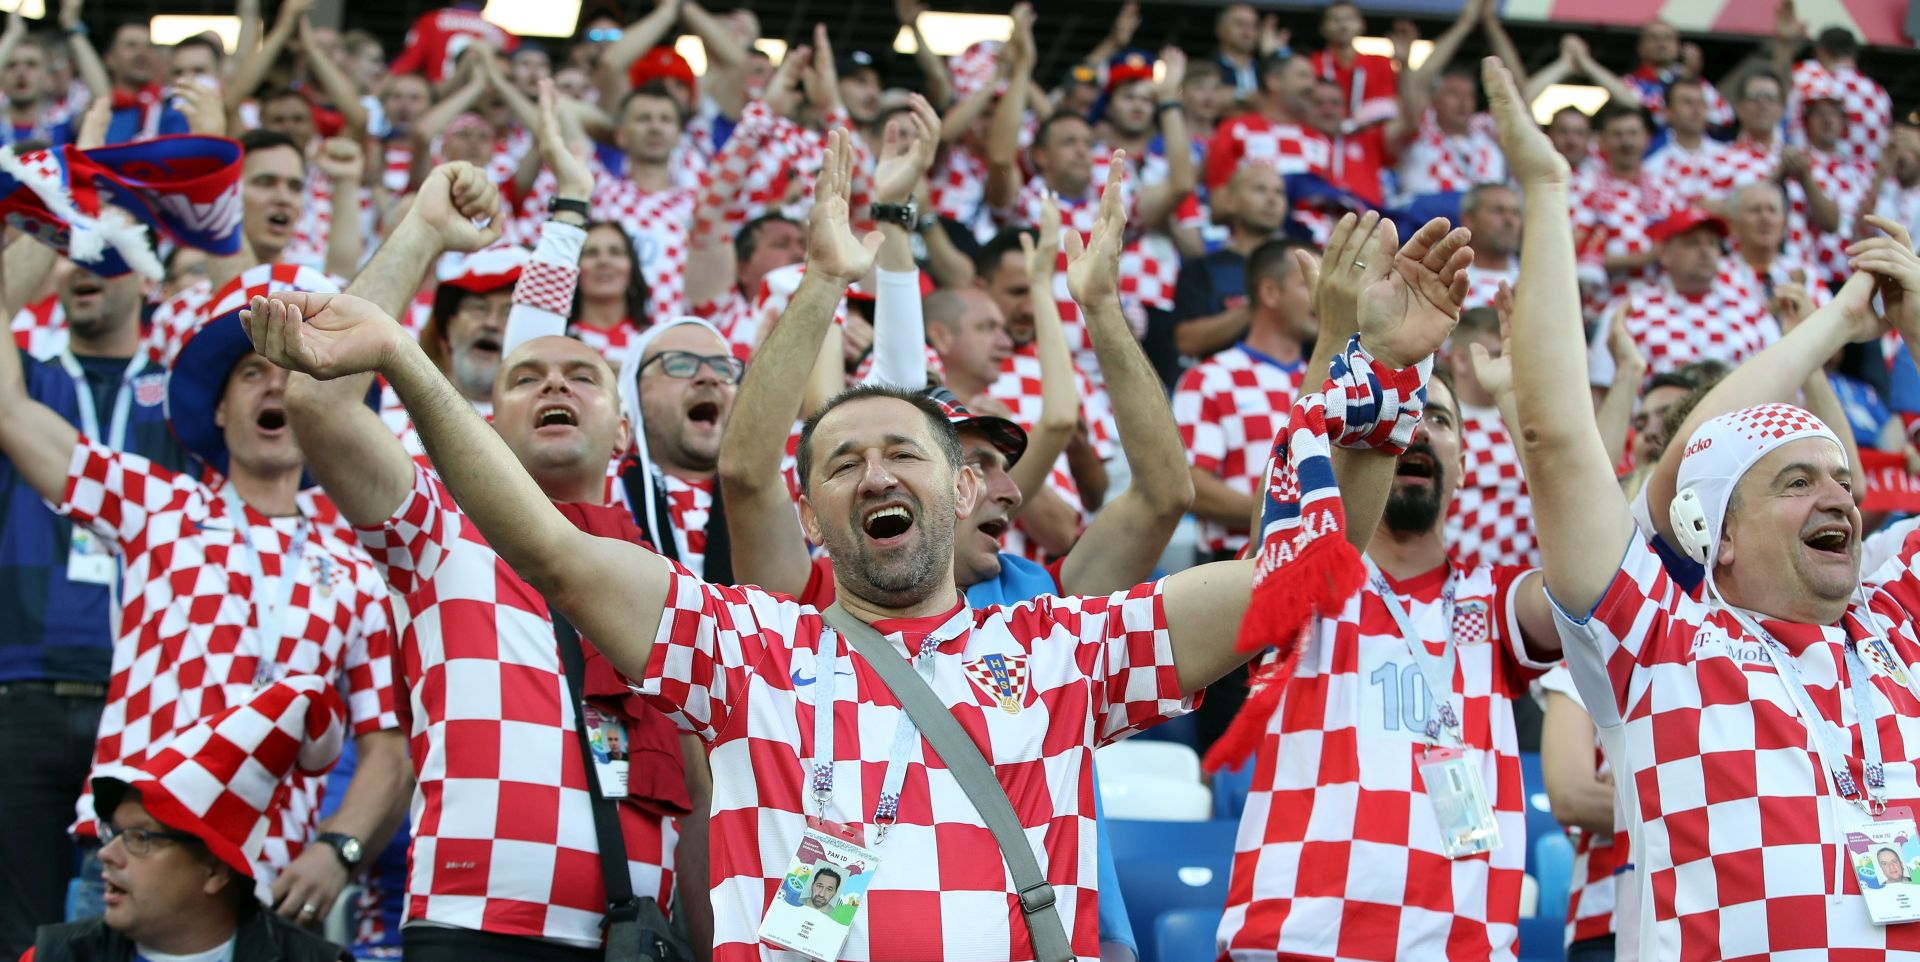 FOTO: Hrvatska u Kalinjingradu igrala na 'domaćem terenu'